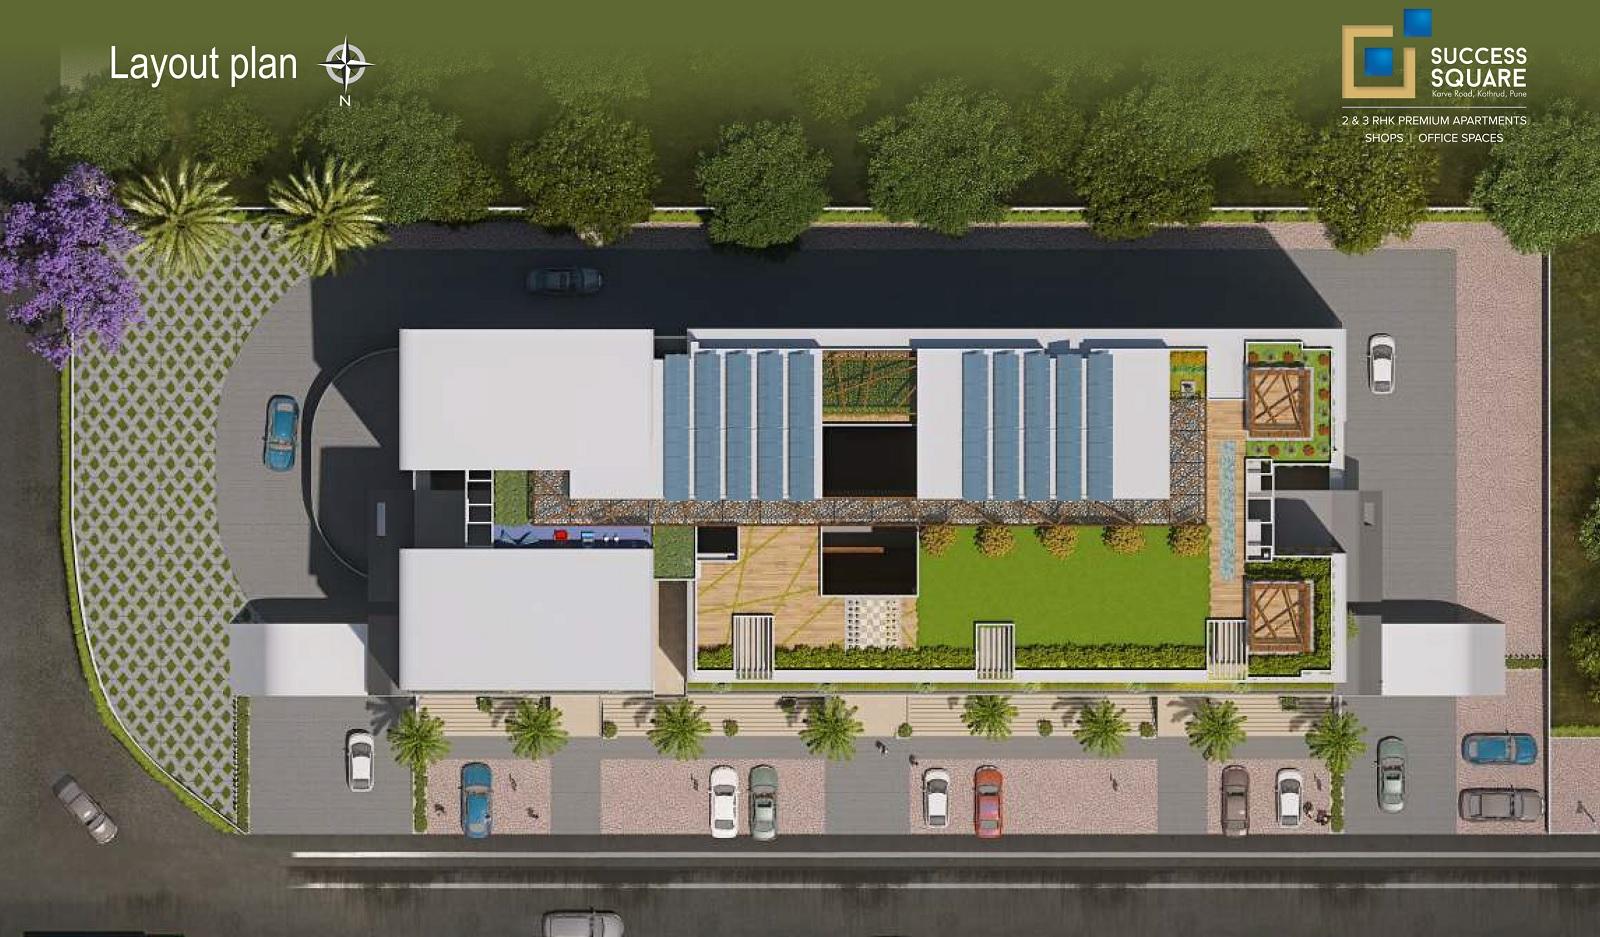 saarrthi success square project master plan image1